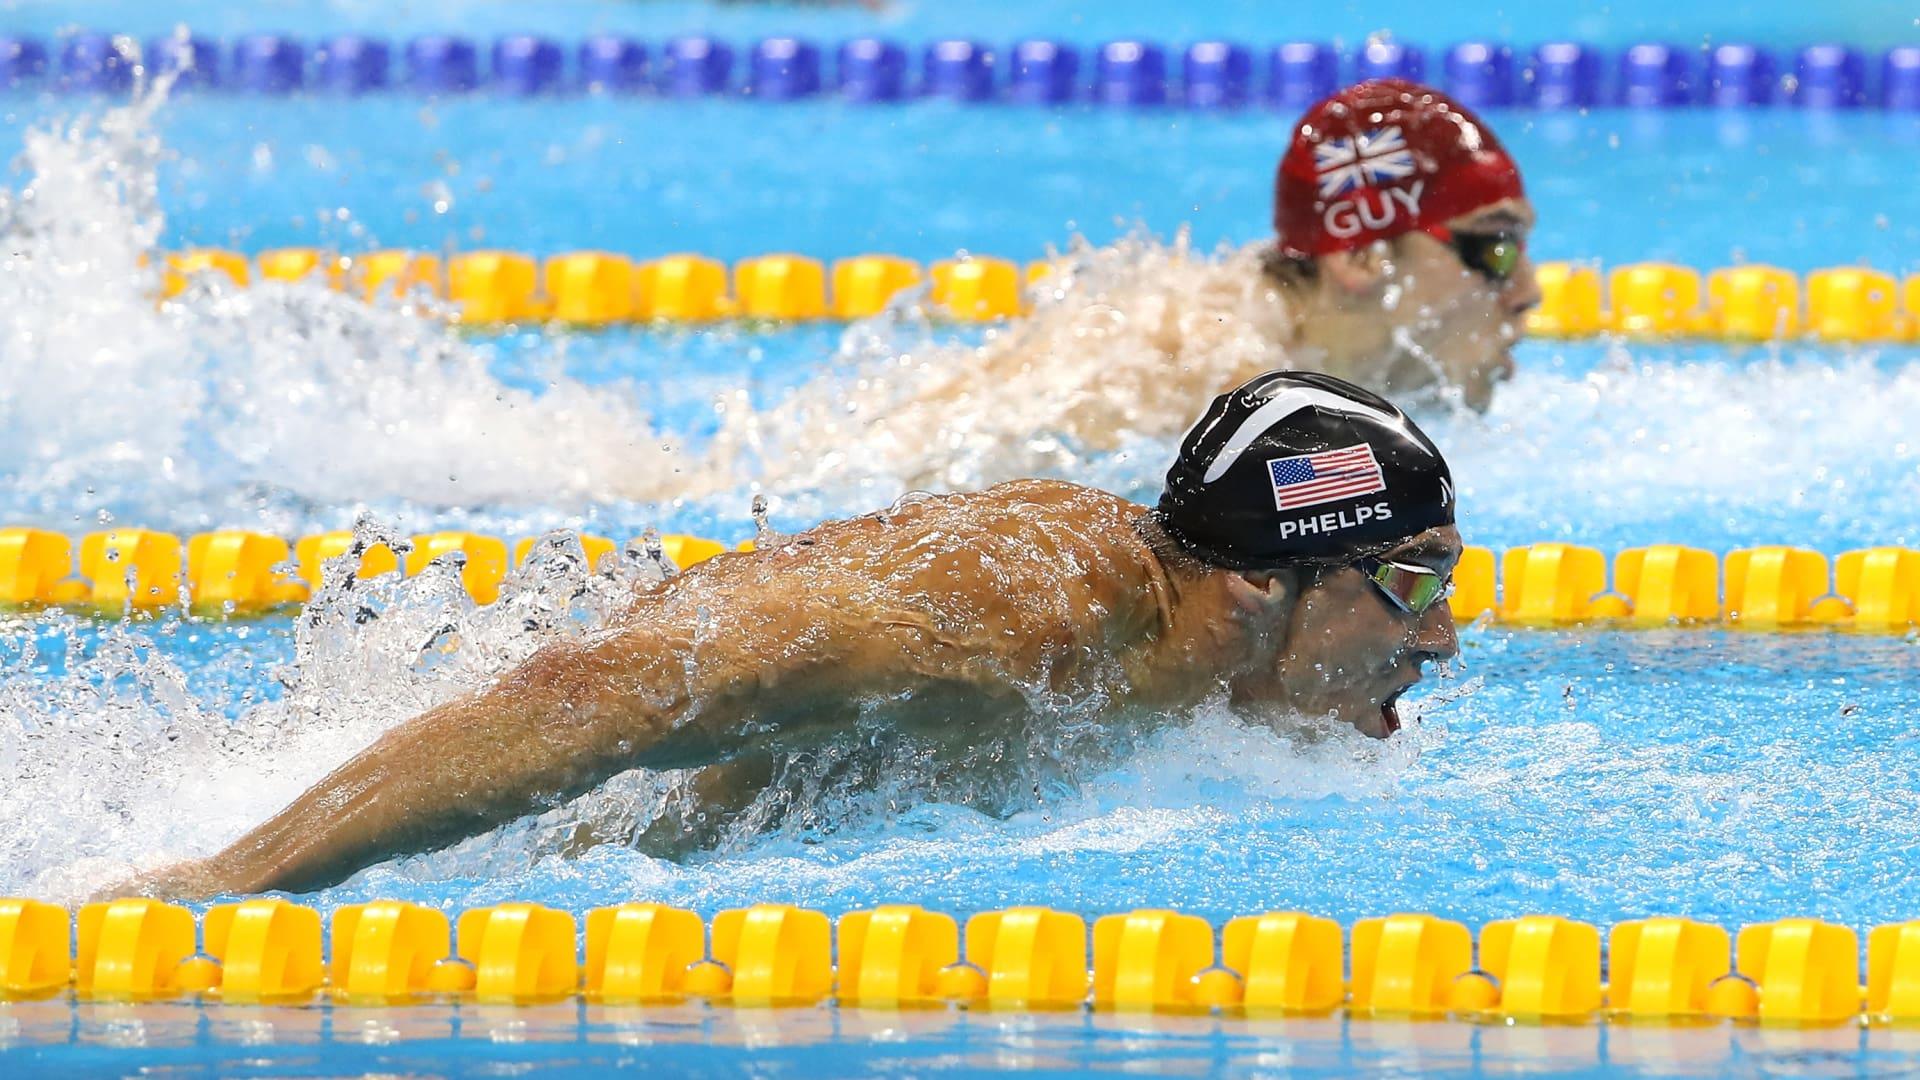 Swimming Olympics Event